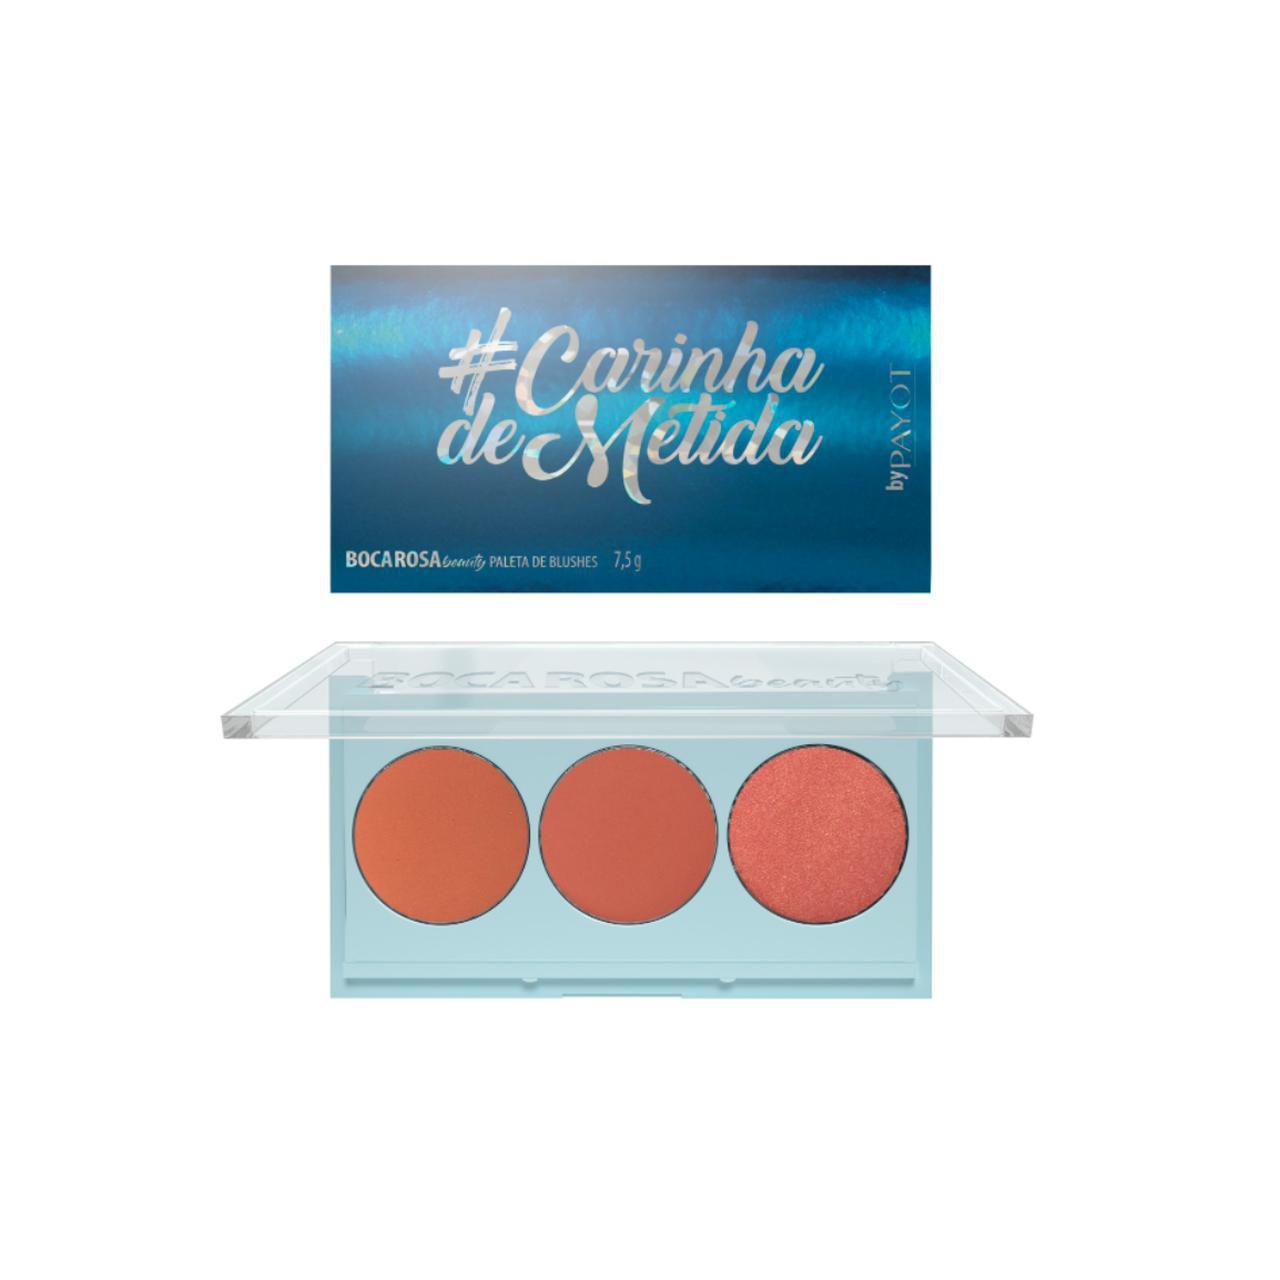 Paleta de Blushes #carinhademetida BOCA ROSA - Payot